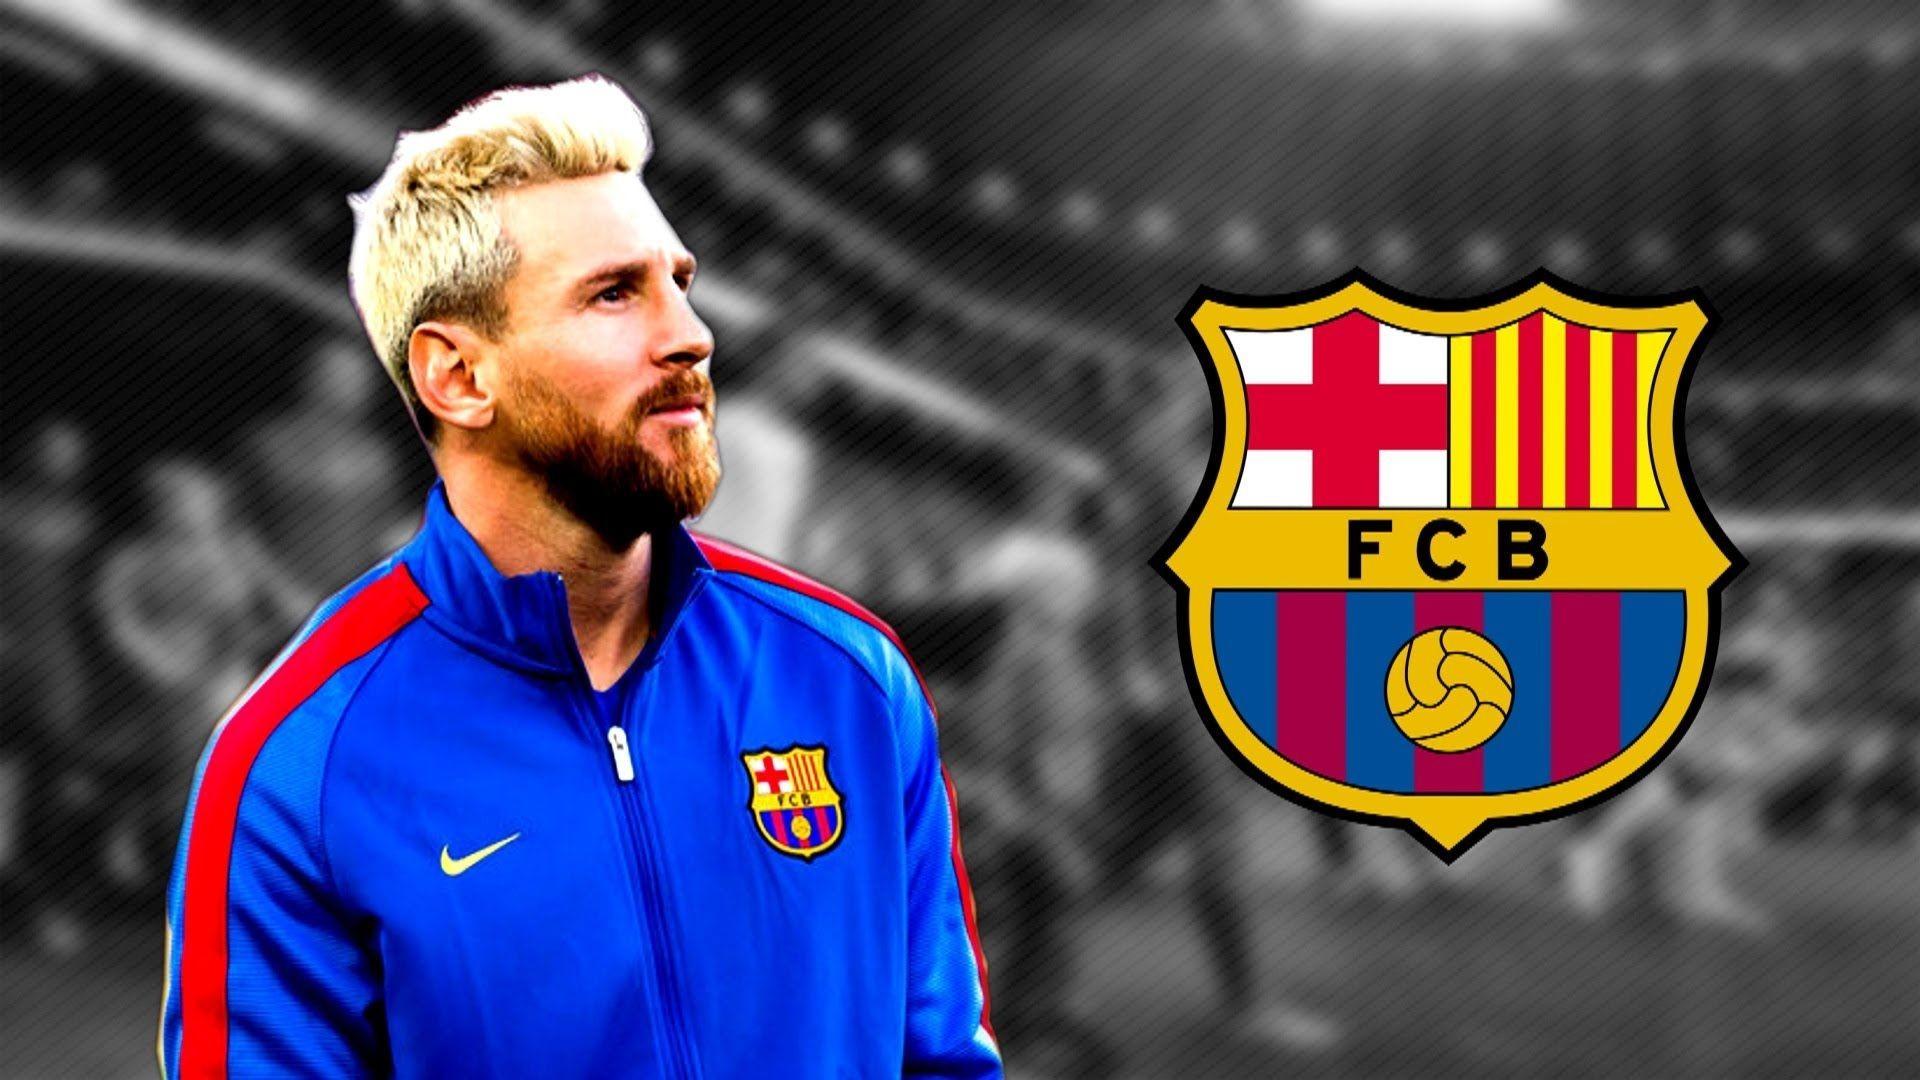 Lionel Messi Wallpaper HD 78 Images